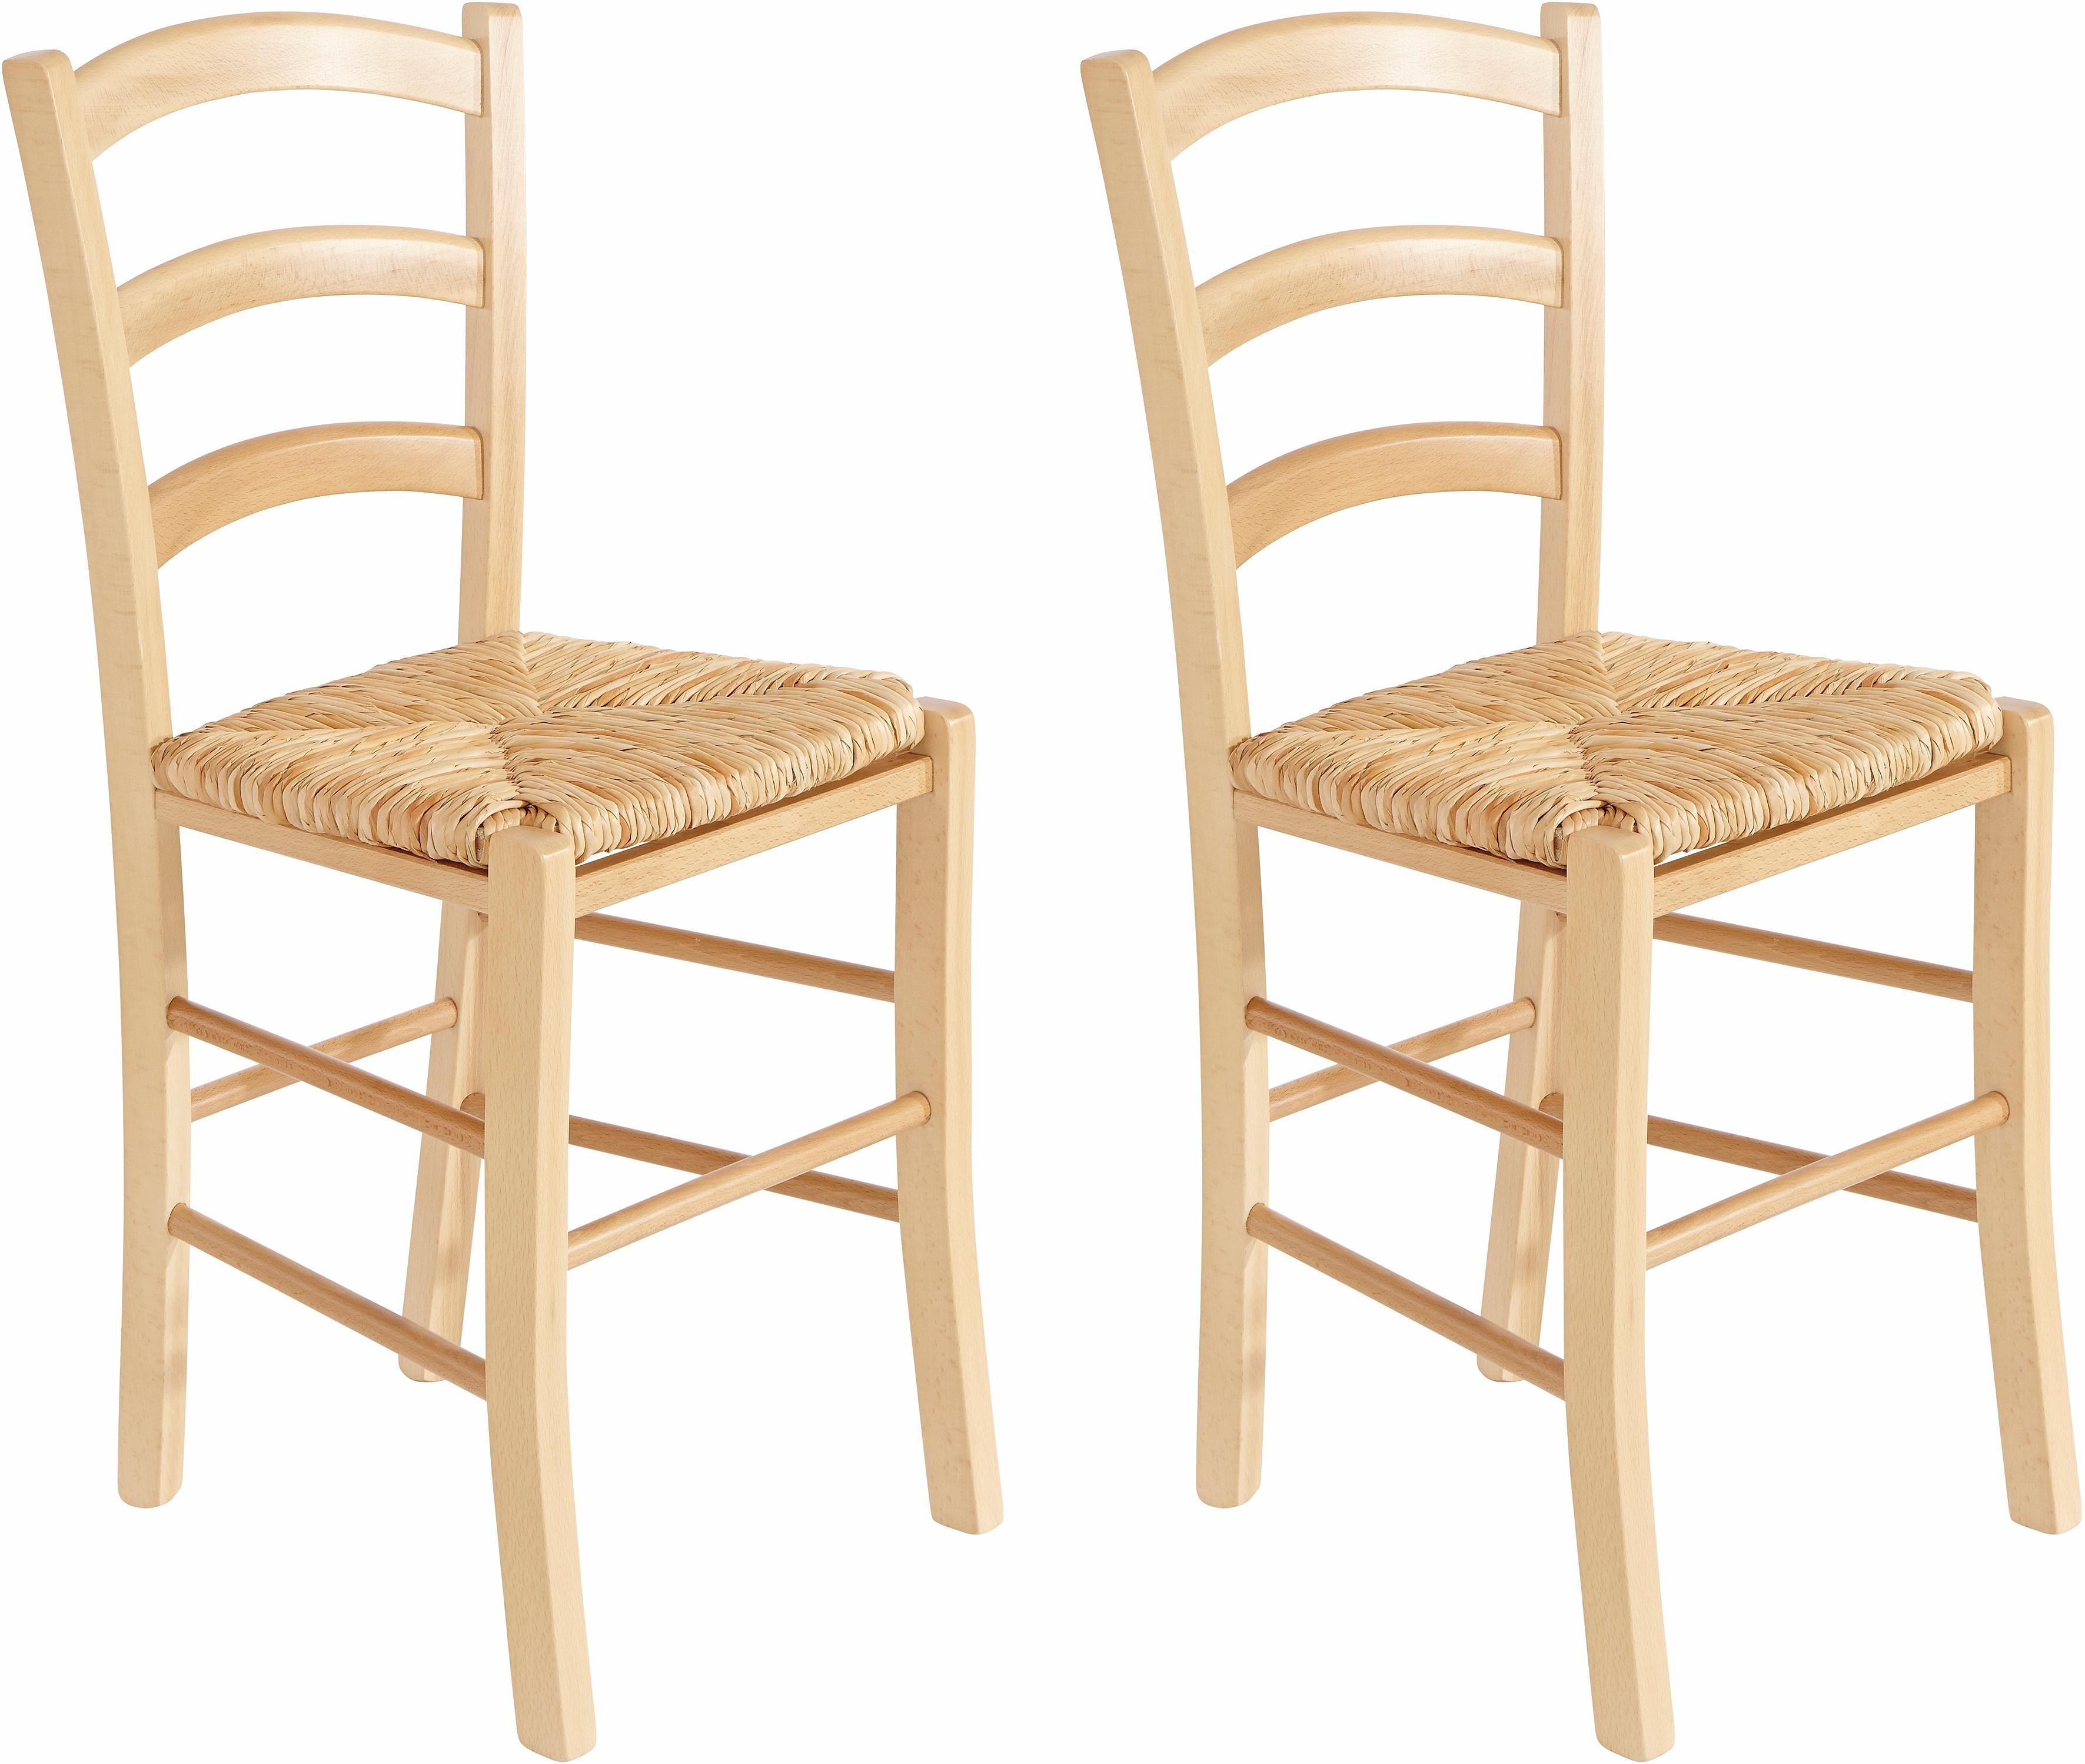 home affaire stoel nico met armleuning set van 2 home affaire stoel van massief grenen in set van 2 home affaire stoel victorie in set van 2